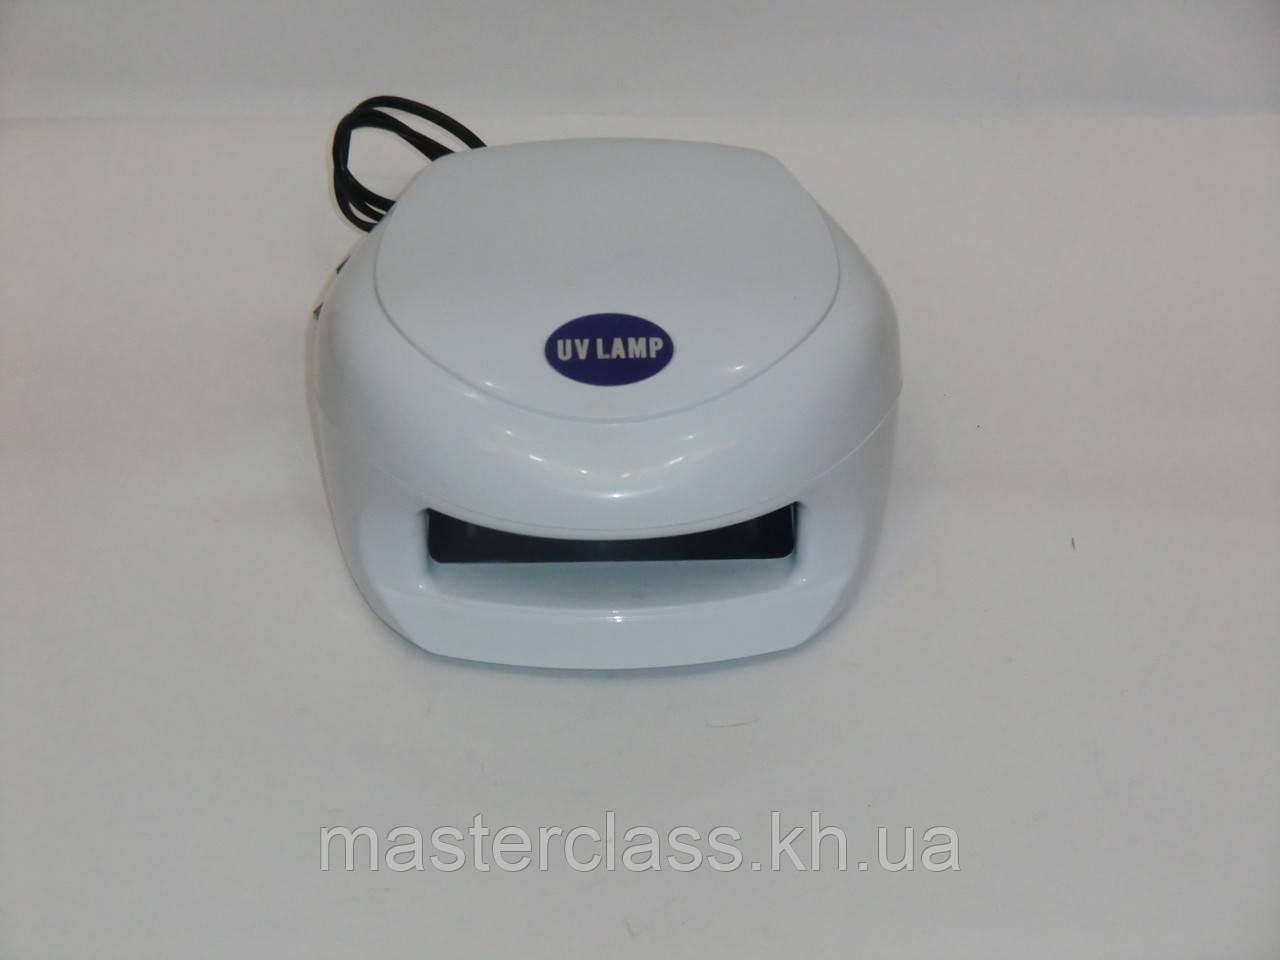 УФ-лампа для ногтей Simei 707